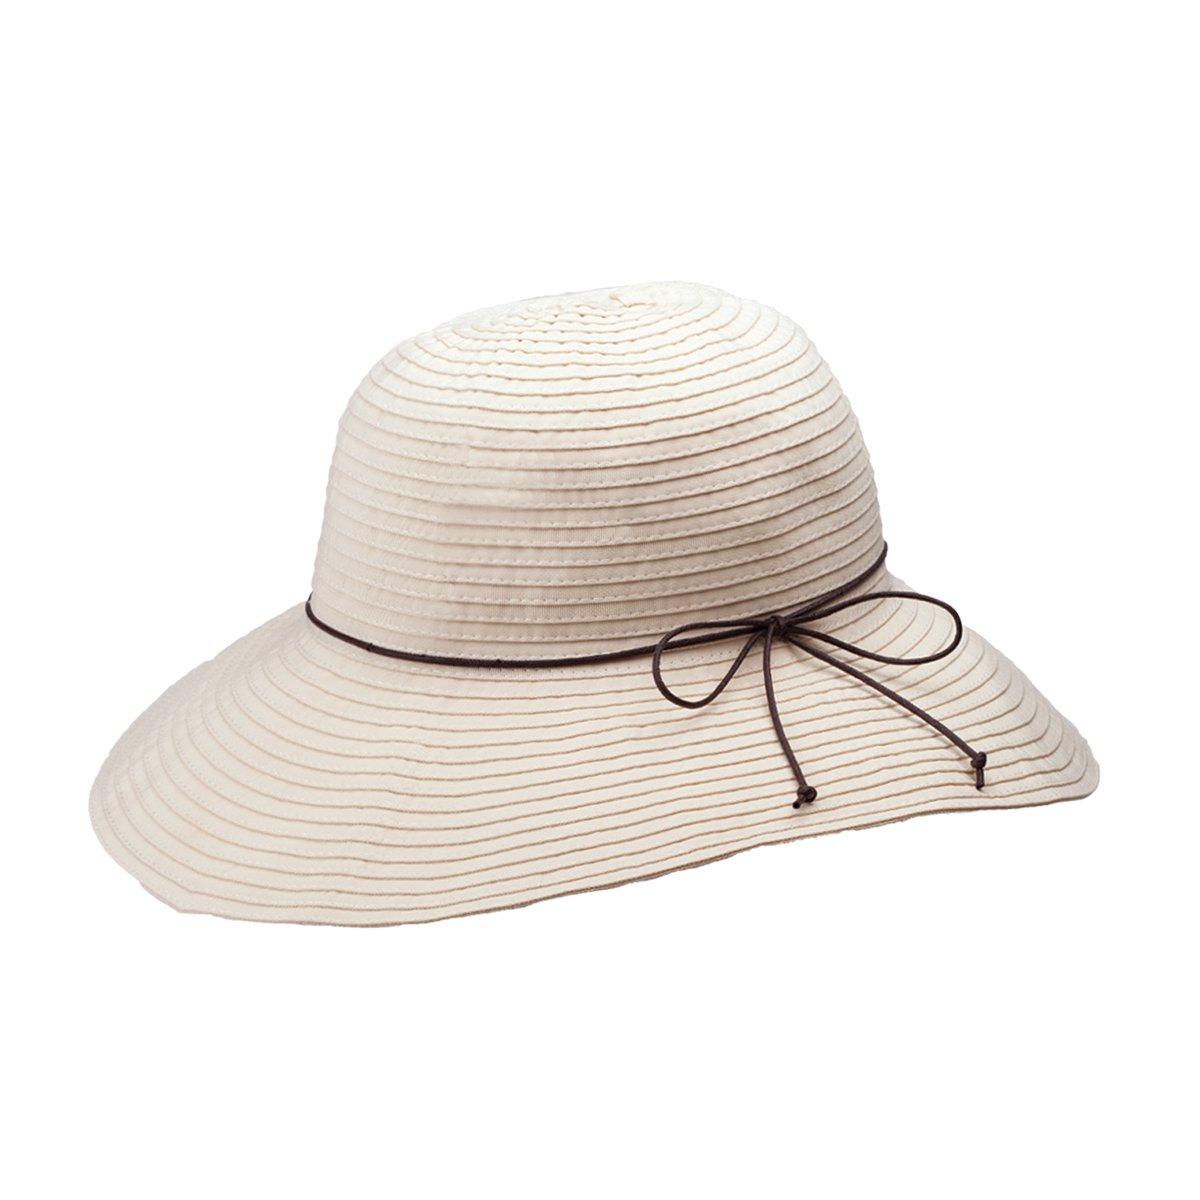 Peter Grimm Womens Karena Resort Hat - Ivory